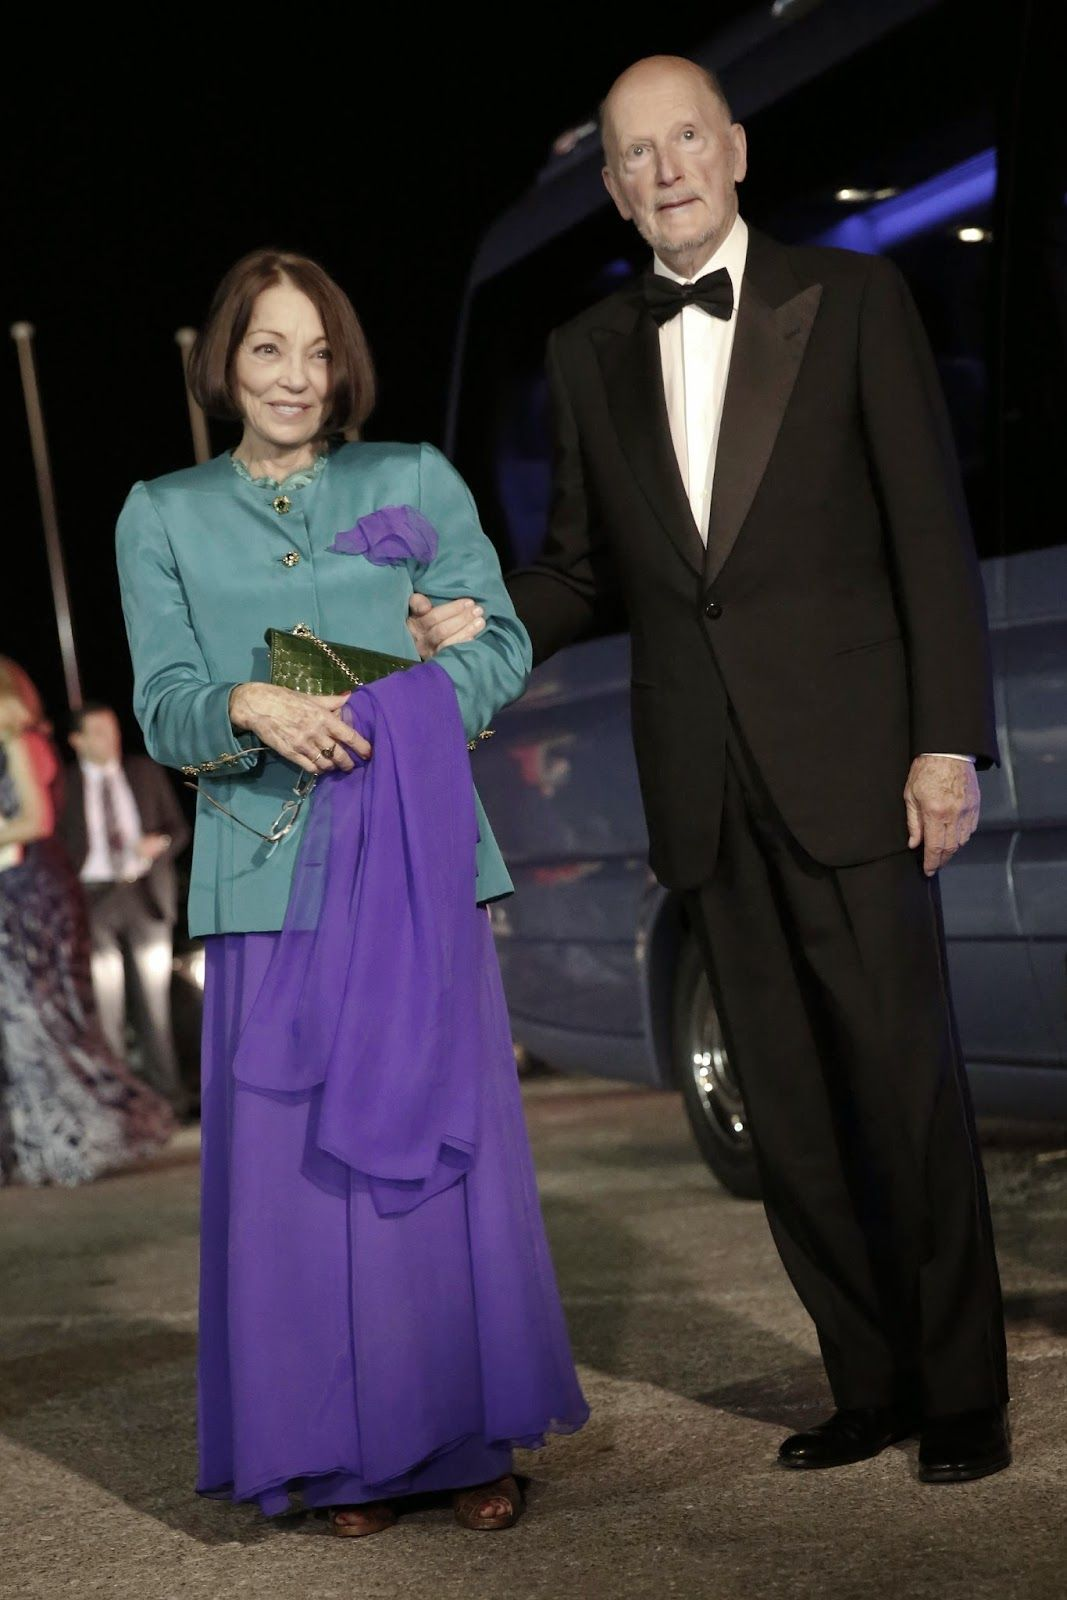 King Constantine & Queen Anne Marie 50th wedding anniversary celebrations Simeon II of Bulgaria and  Margarita Gómez-Acebo